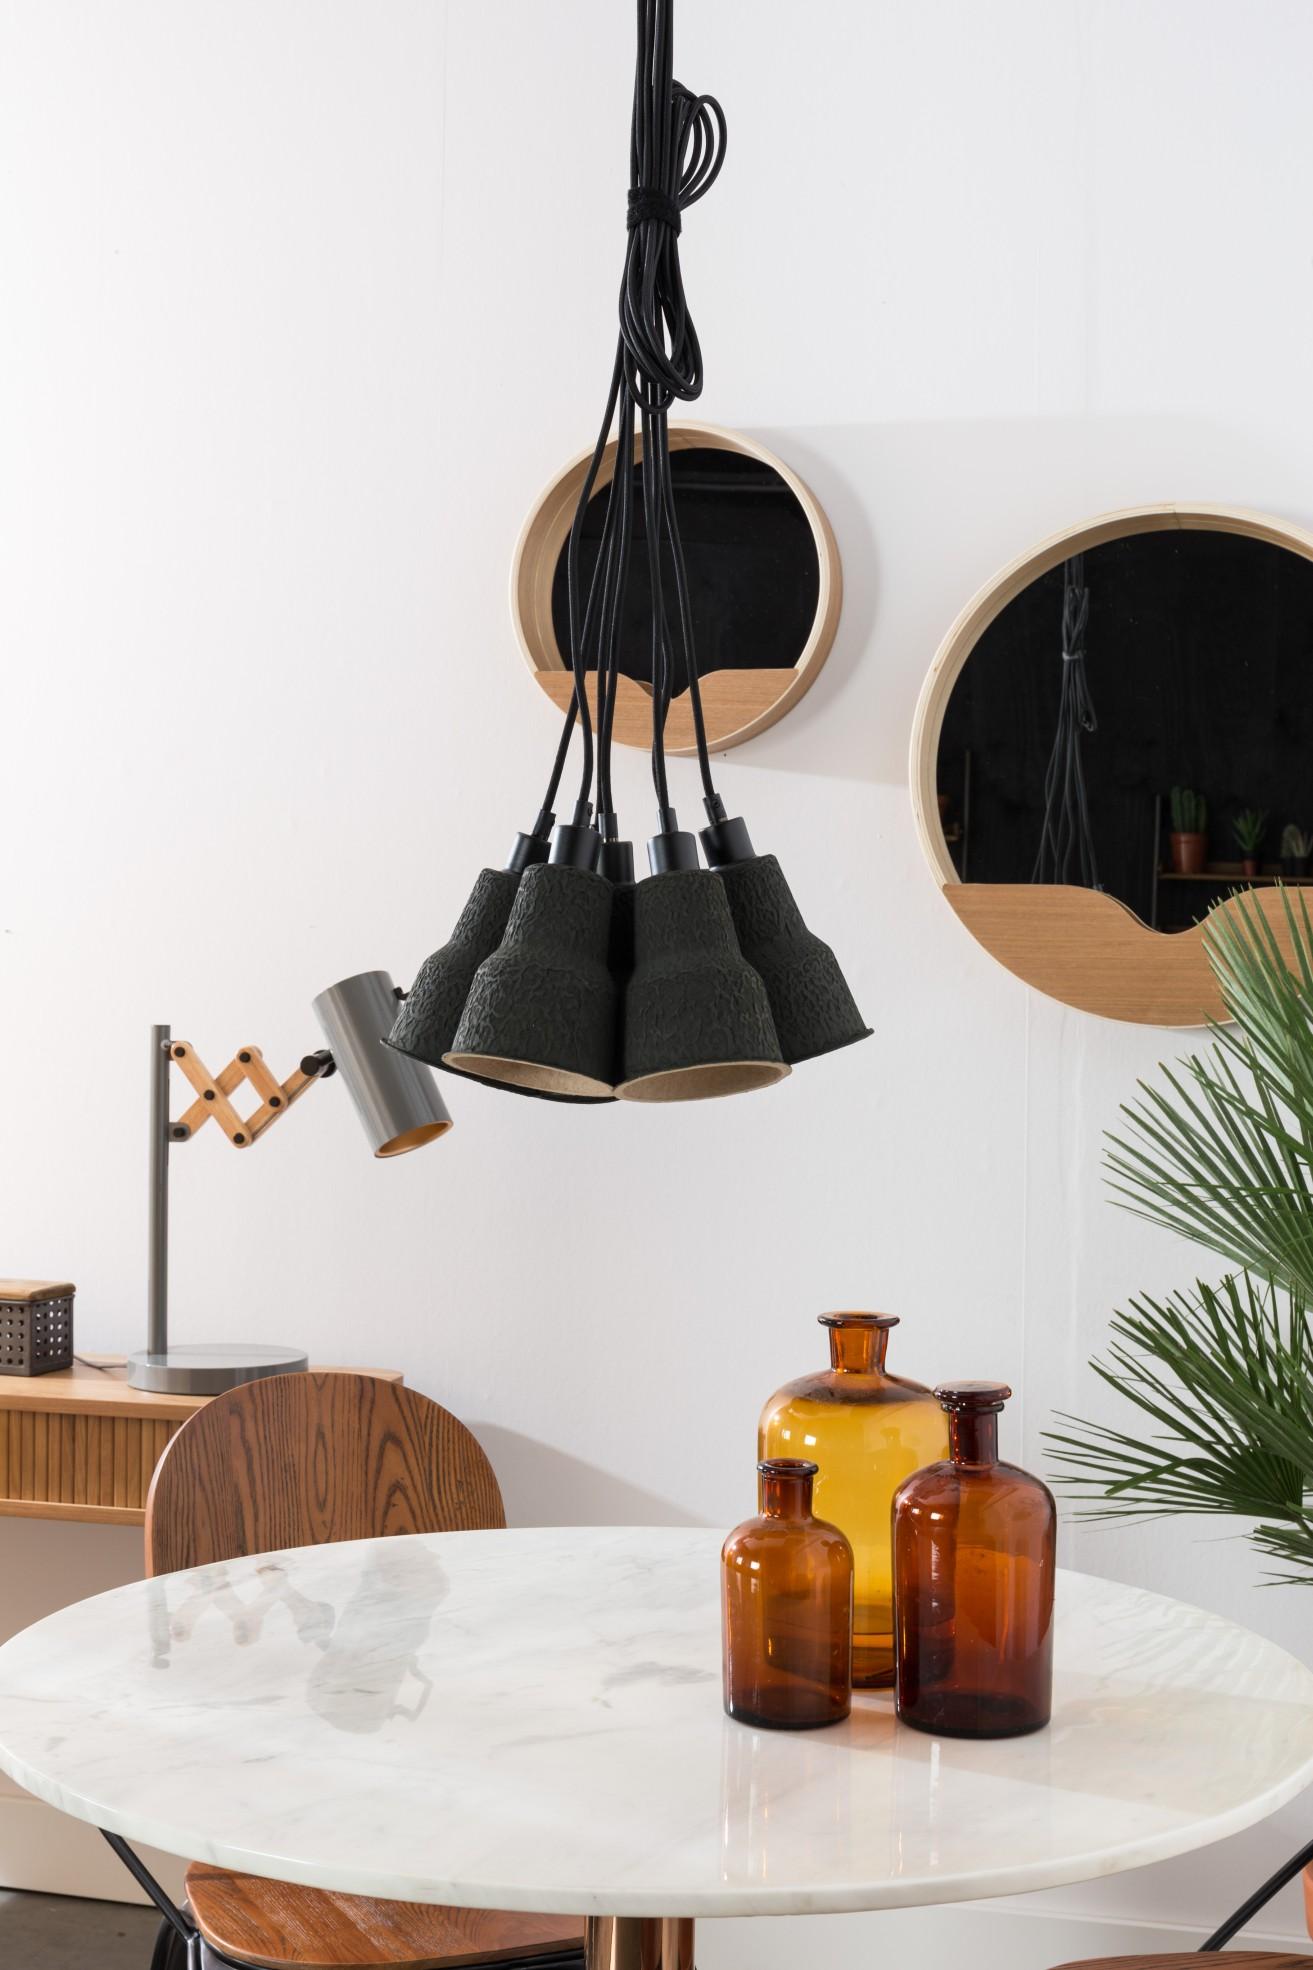 Zuiver Hanglamp Pulp Shades -Ø12 X H19 Cm - Zwart